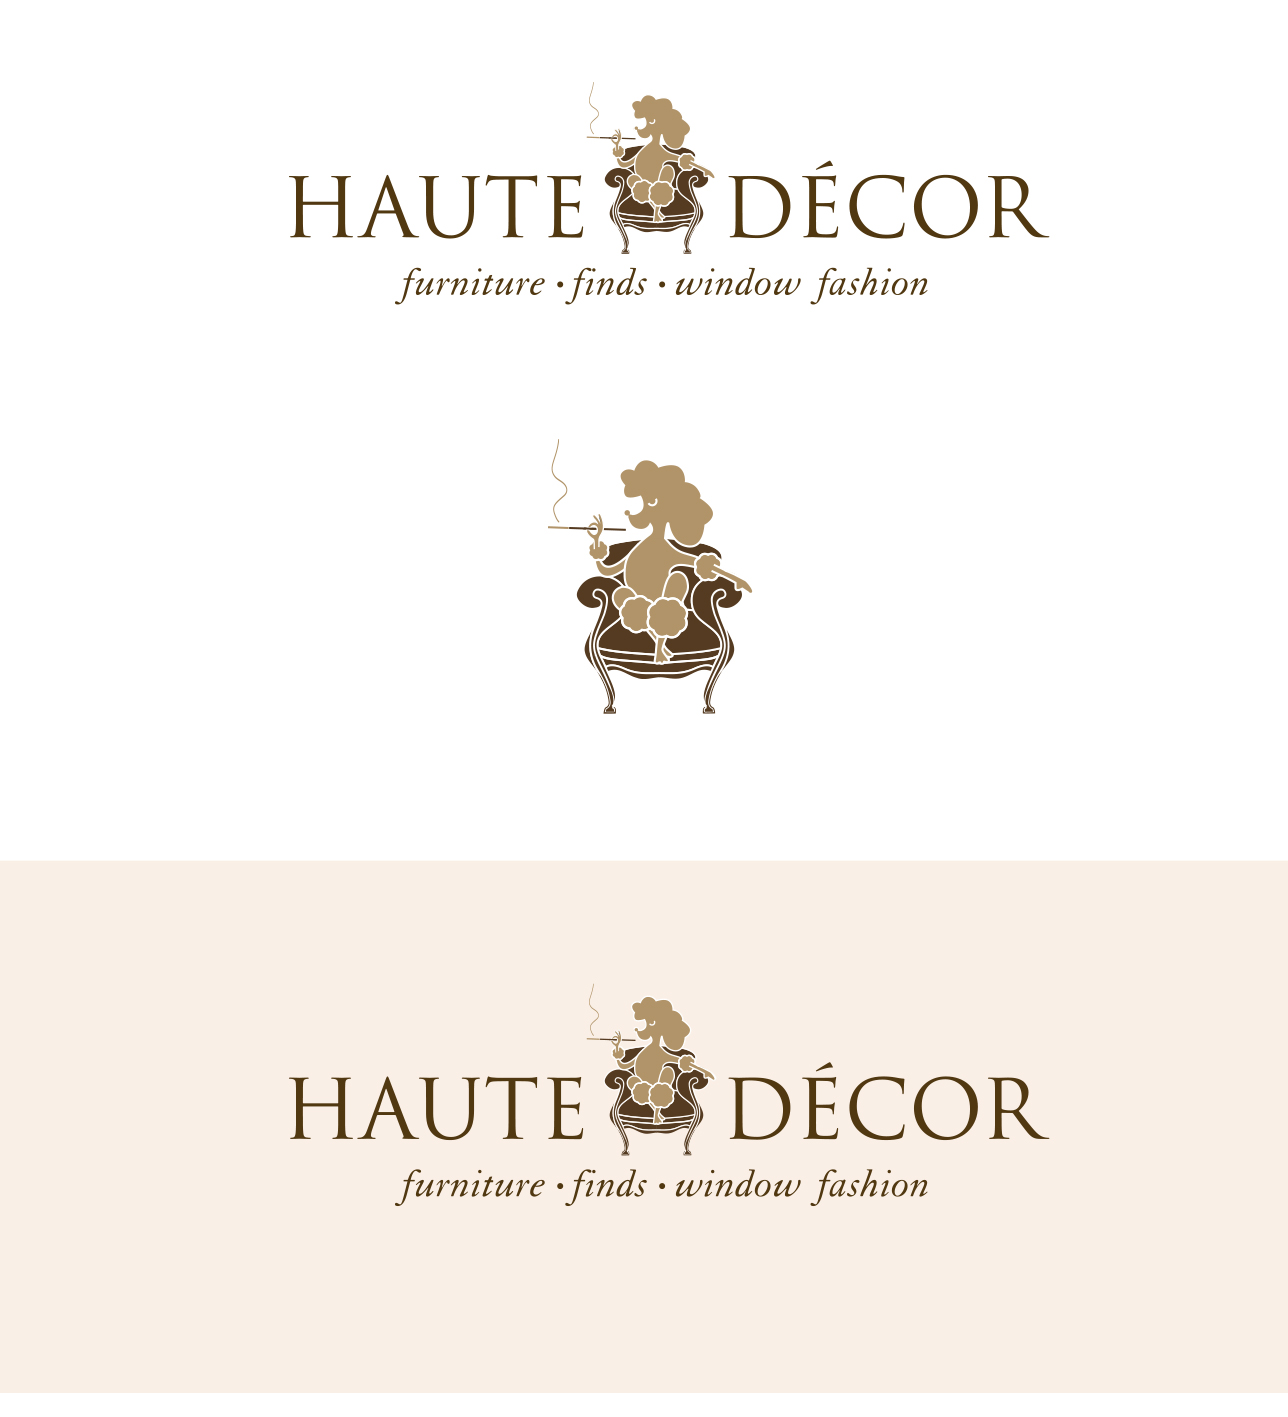 haute-decor-logo-design2